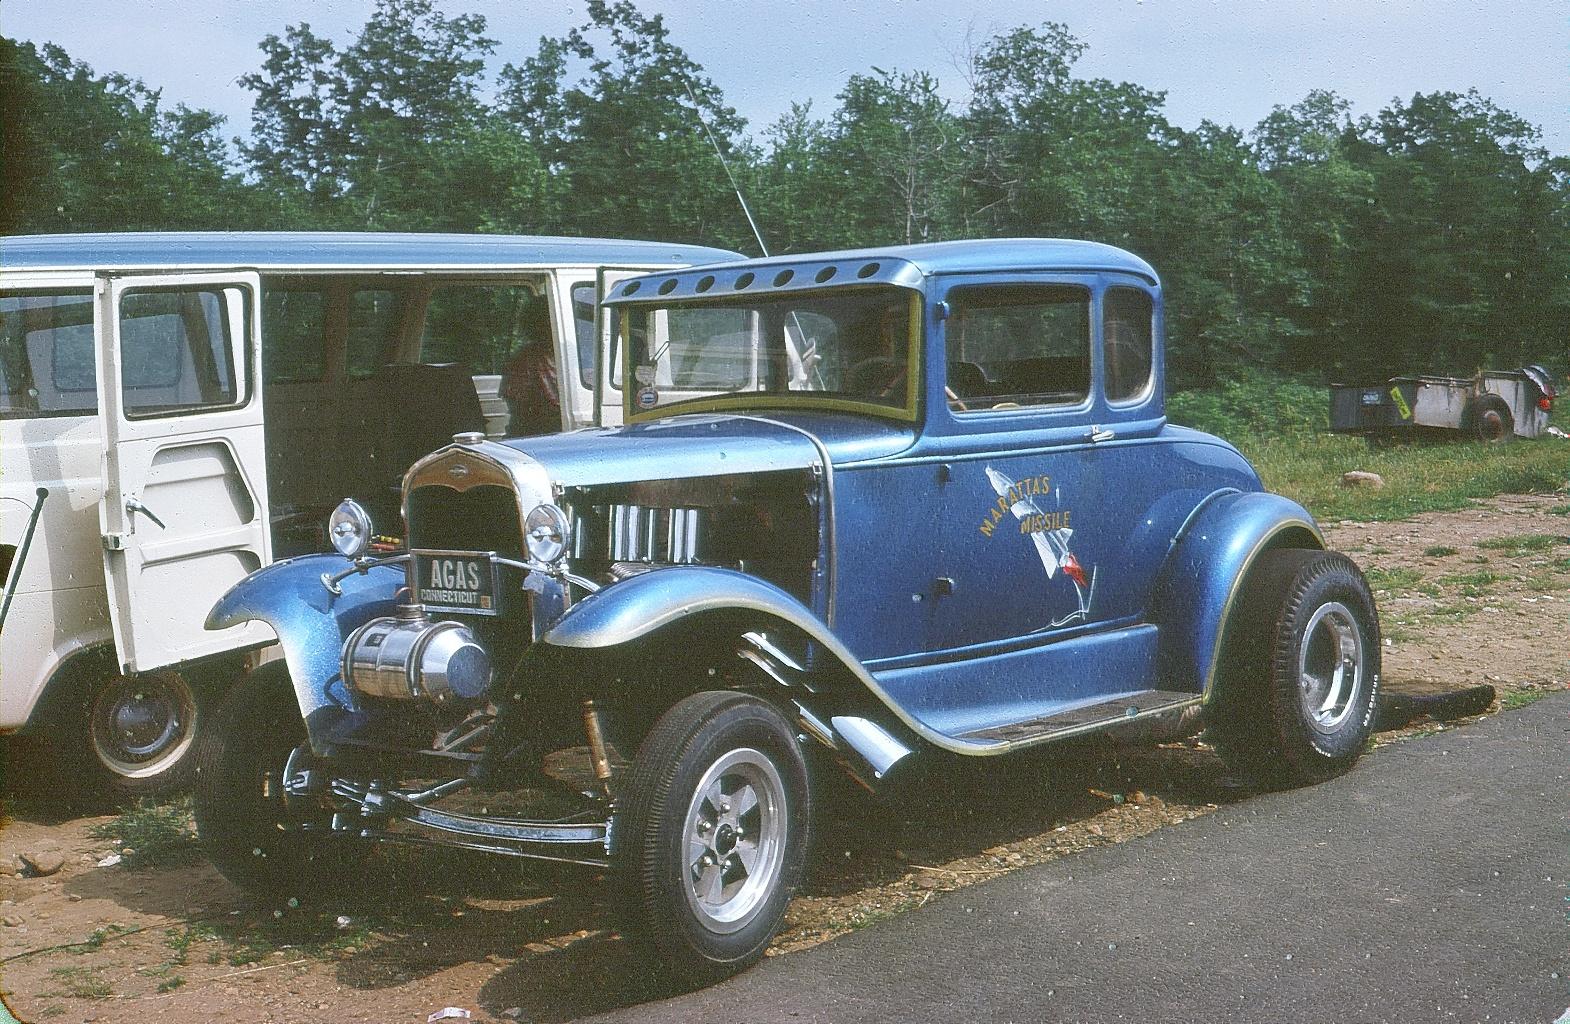 macs cars Picture 227.jpg